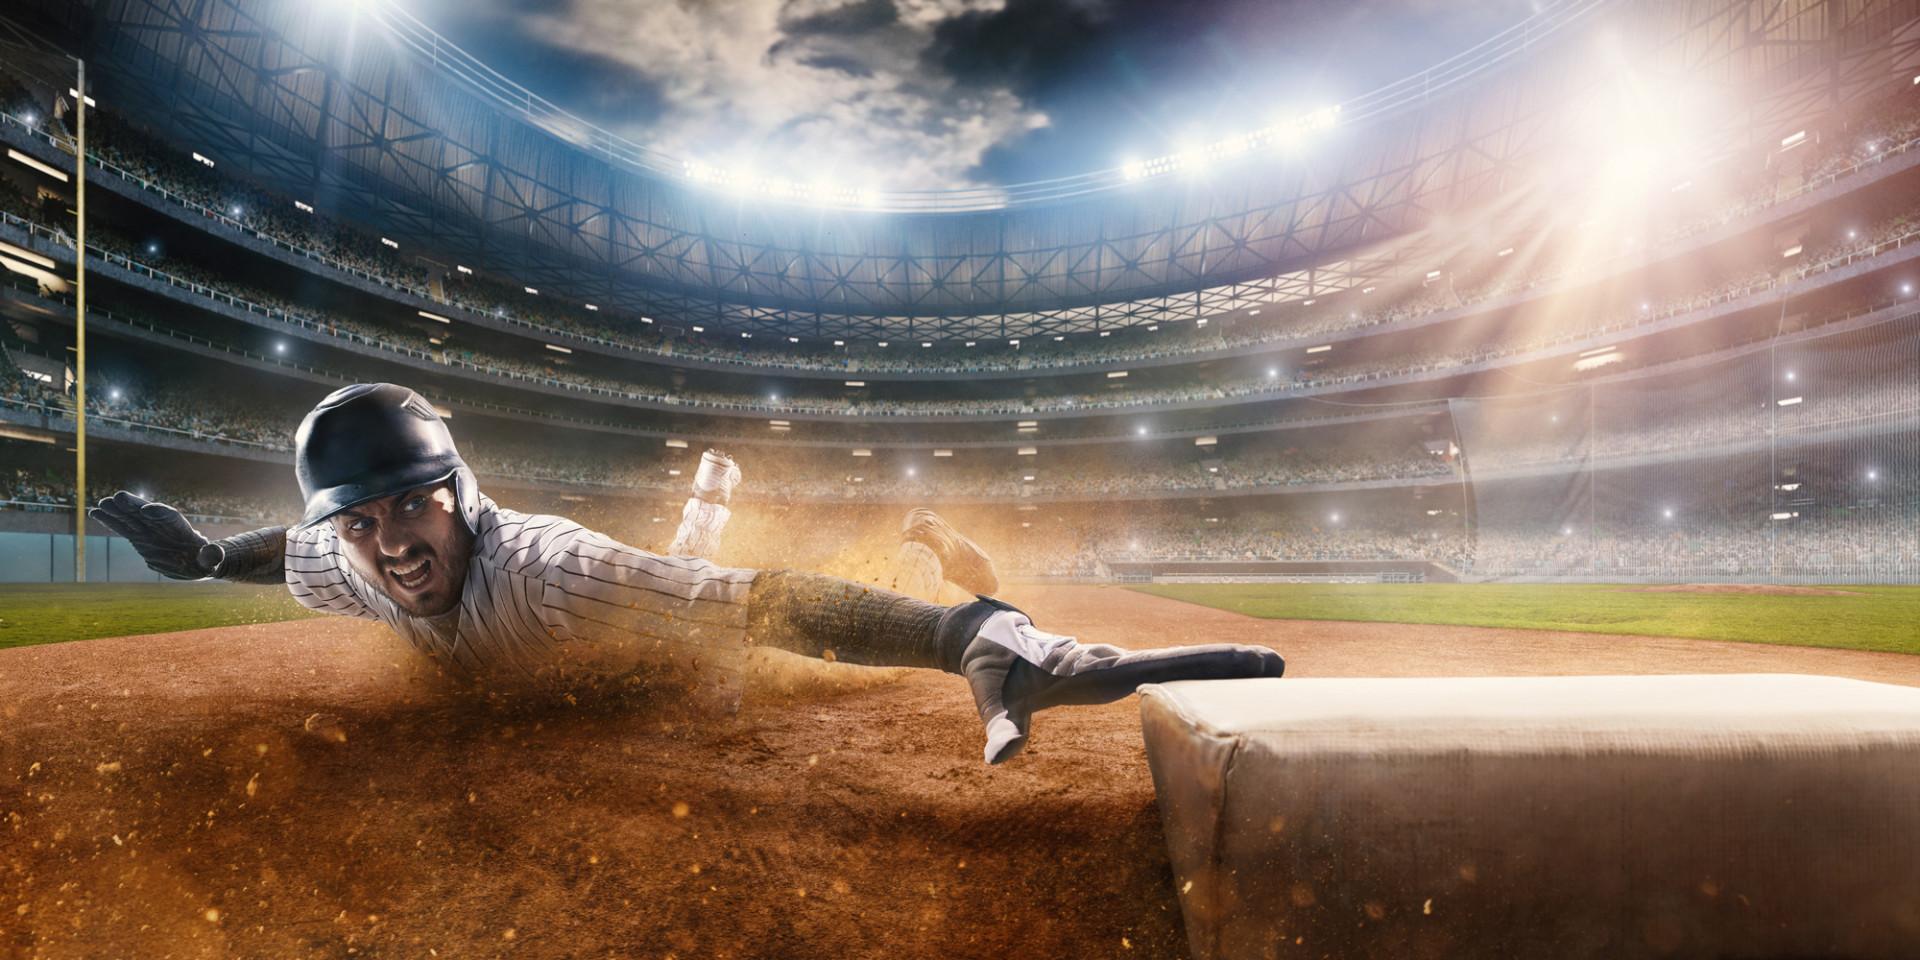 23_03_2016_baseball_game_015-1920x960